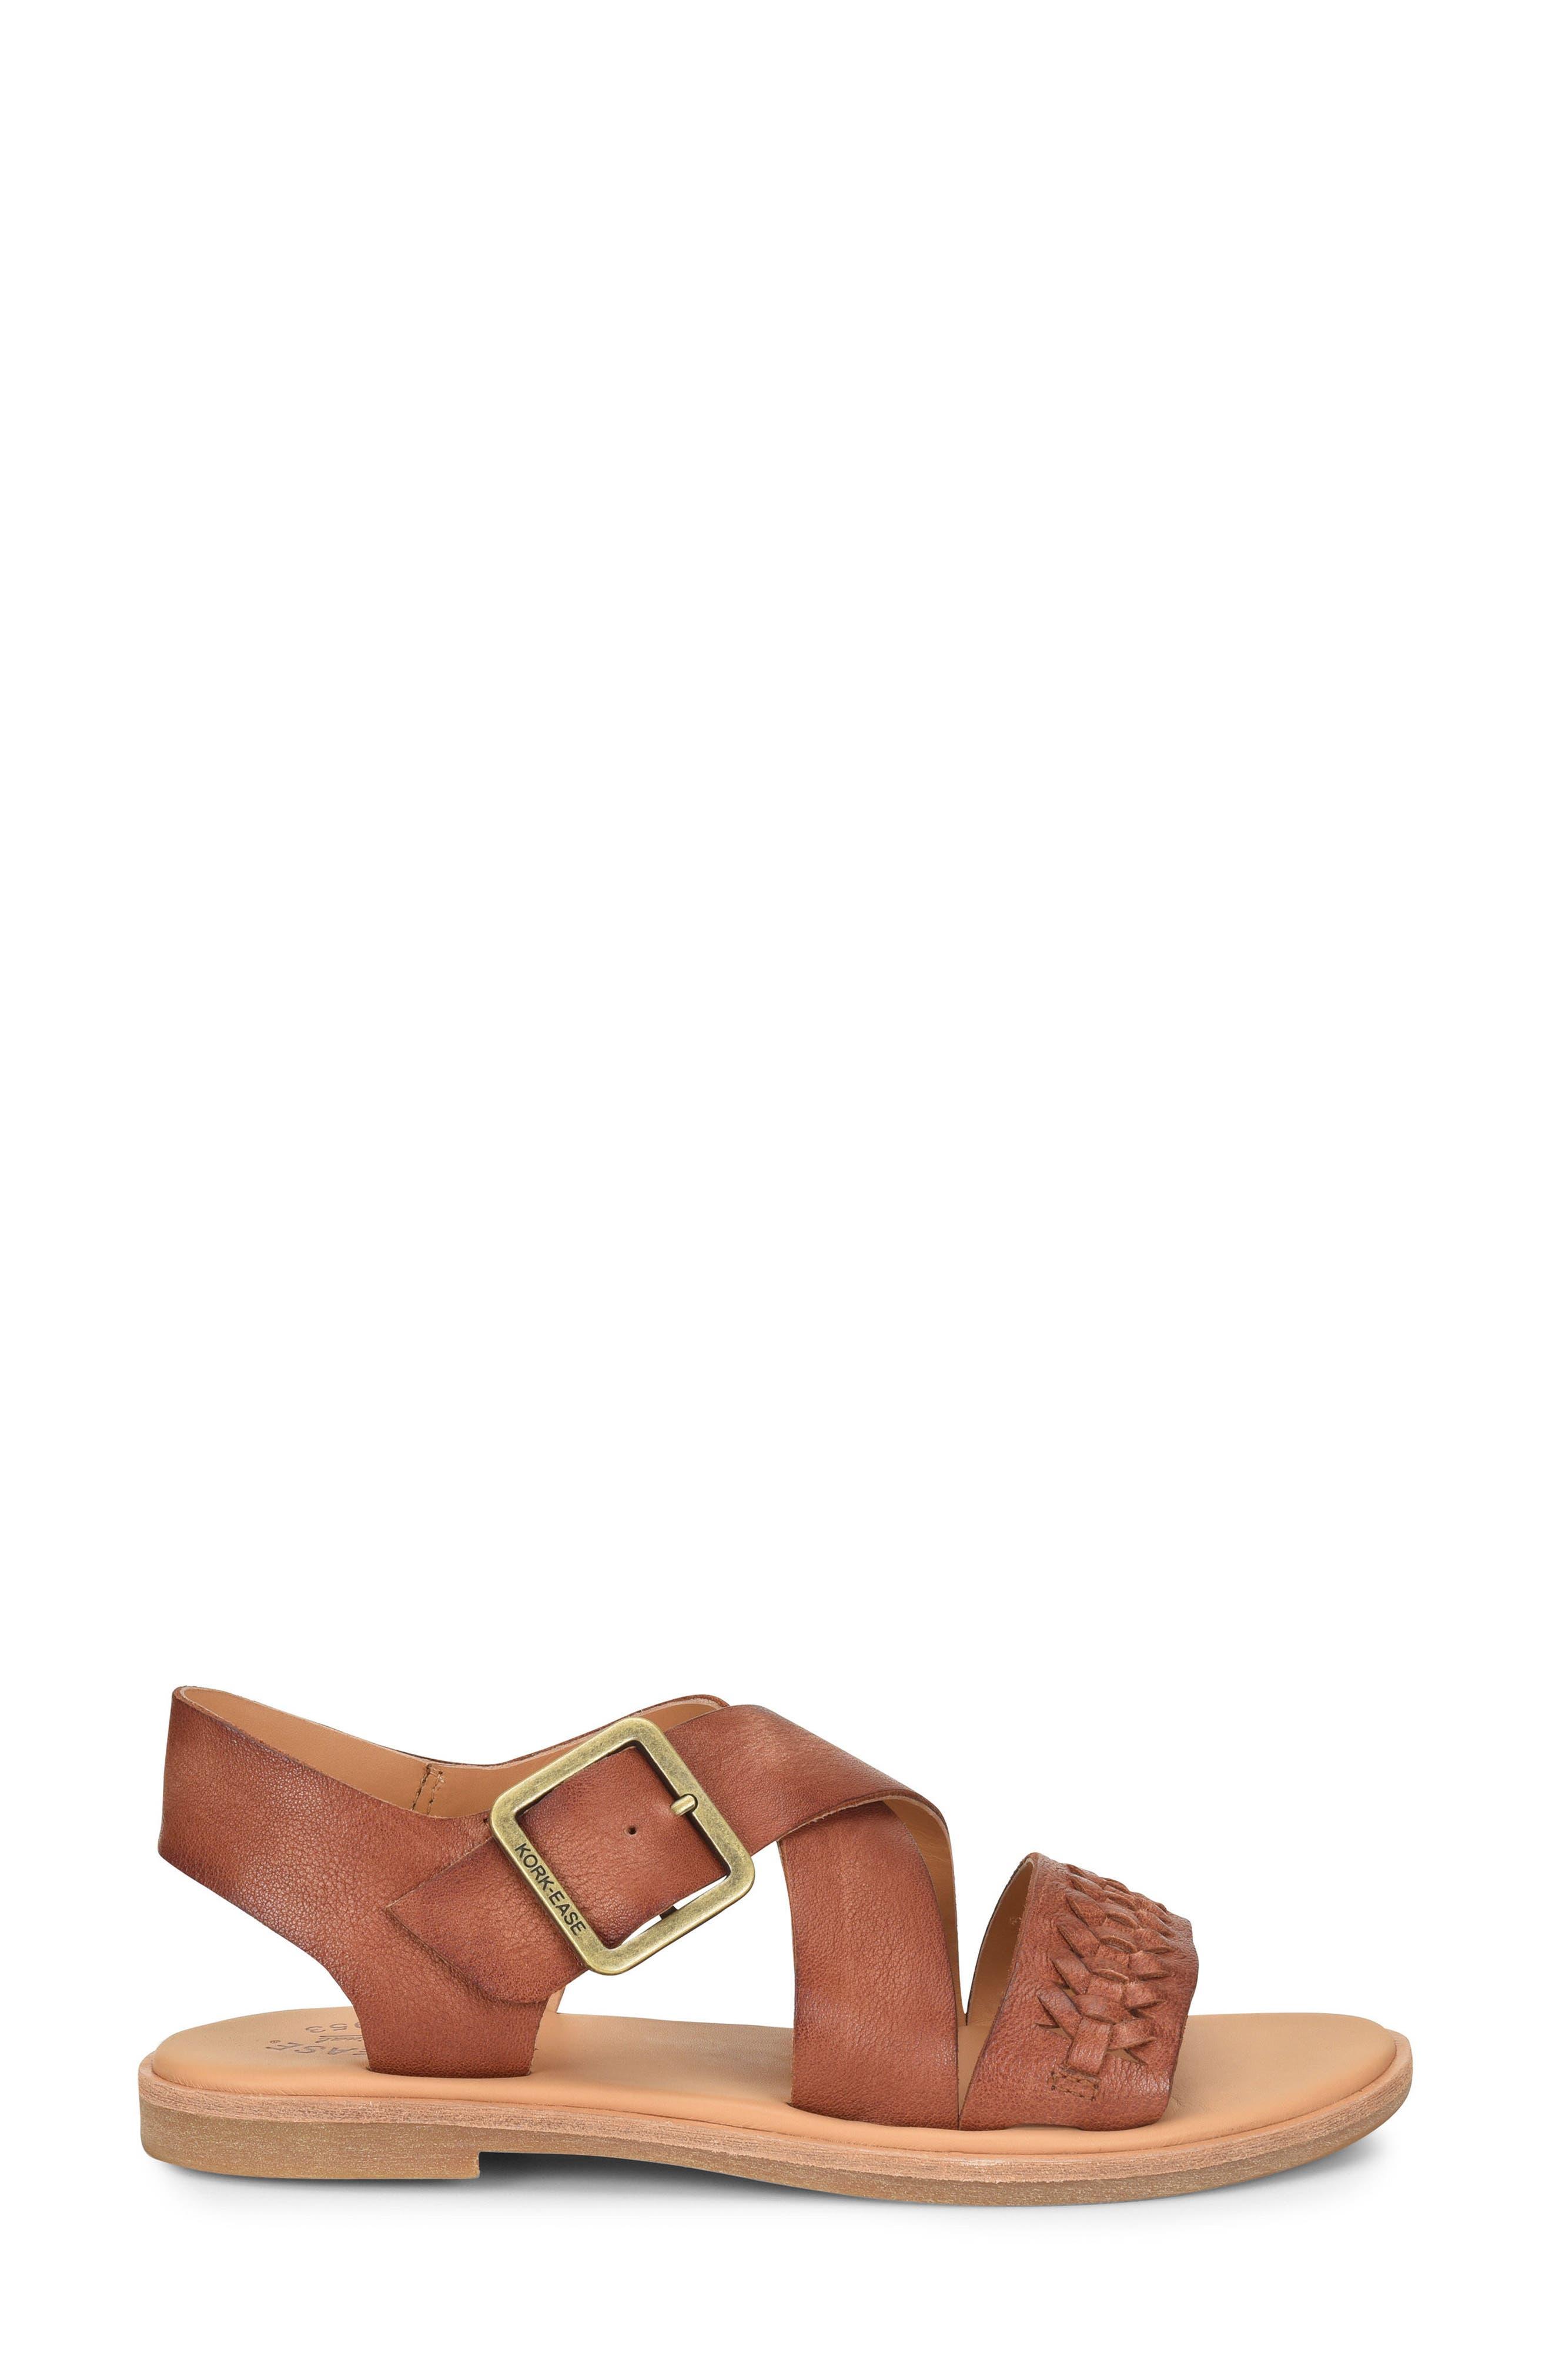 Nara Braid Sandal,                             Alternate thumbnail 3, color,                             BROWN LEATHER